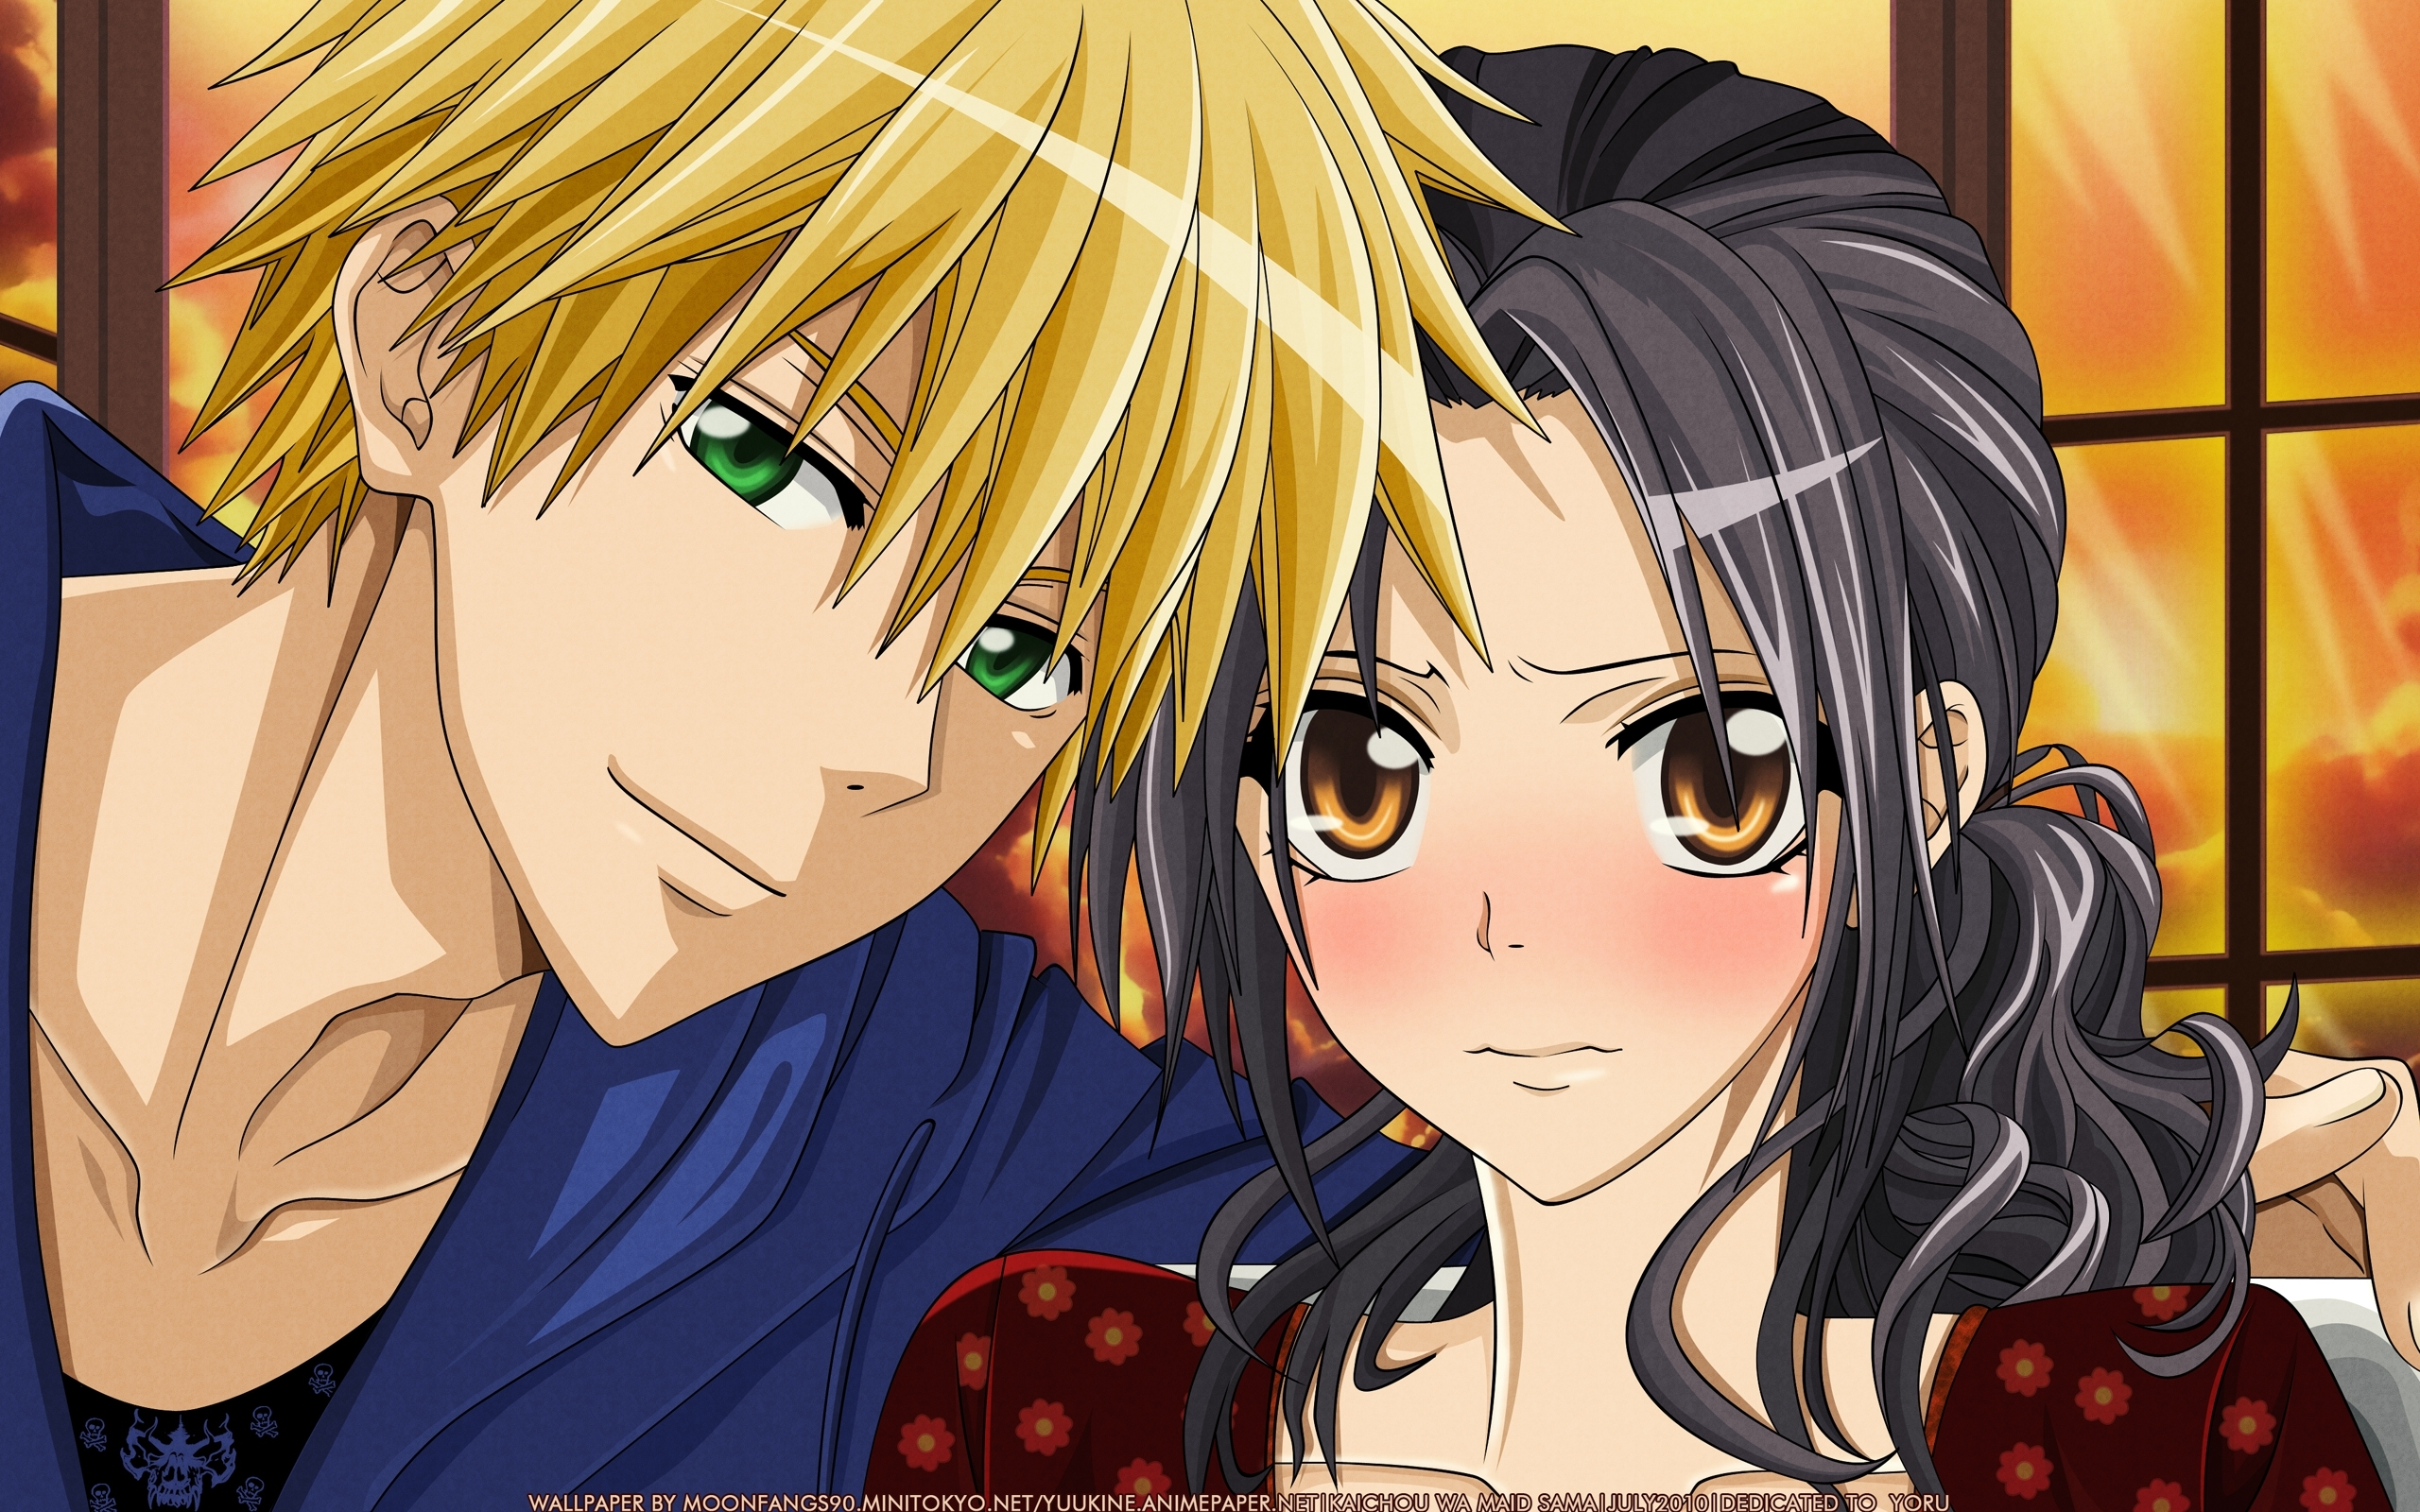 kaichou wa maid-sama!, wallpaper - zerochan anime image board